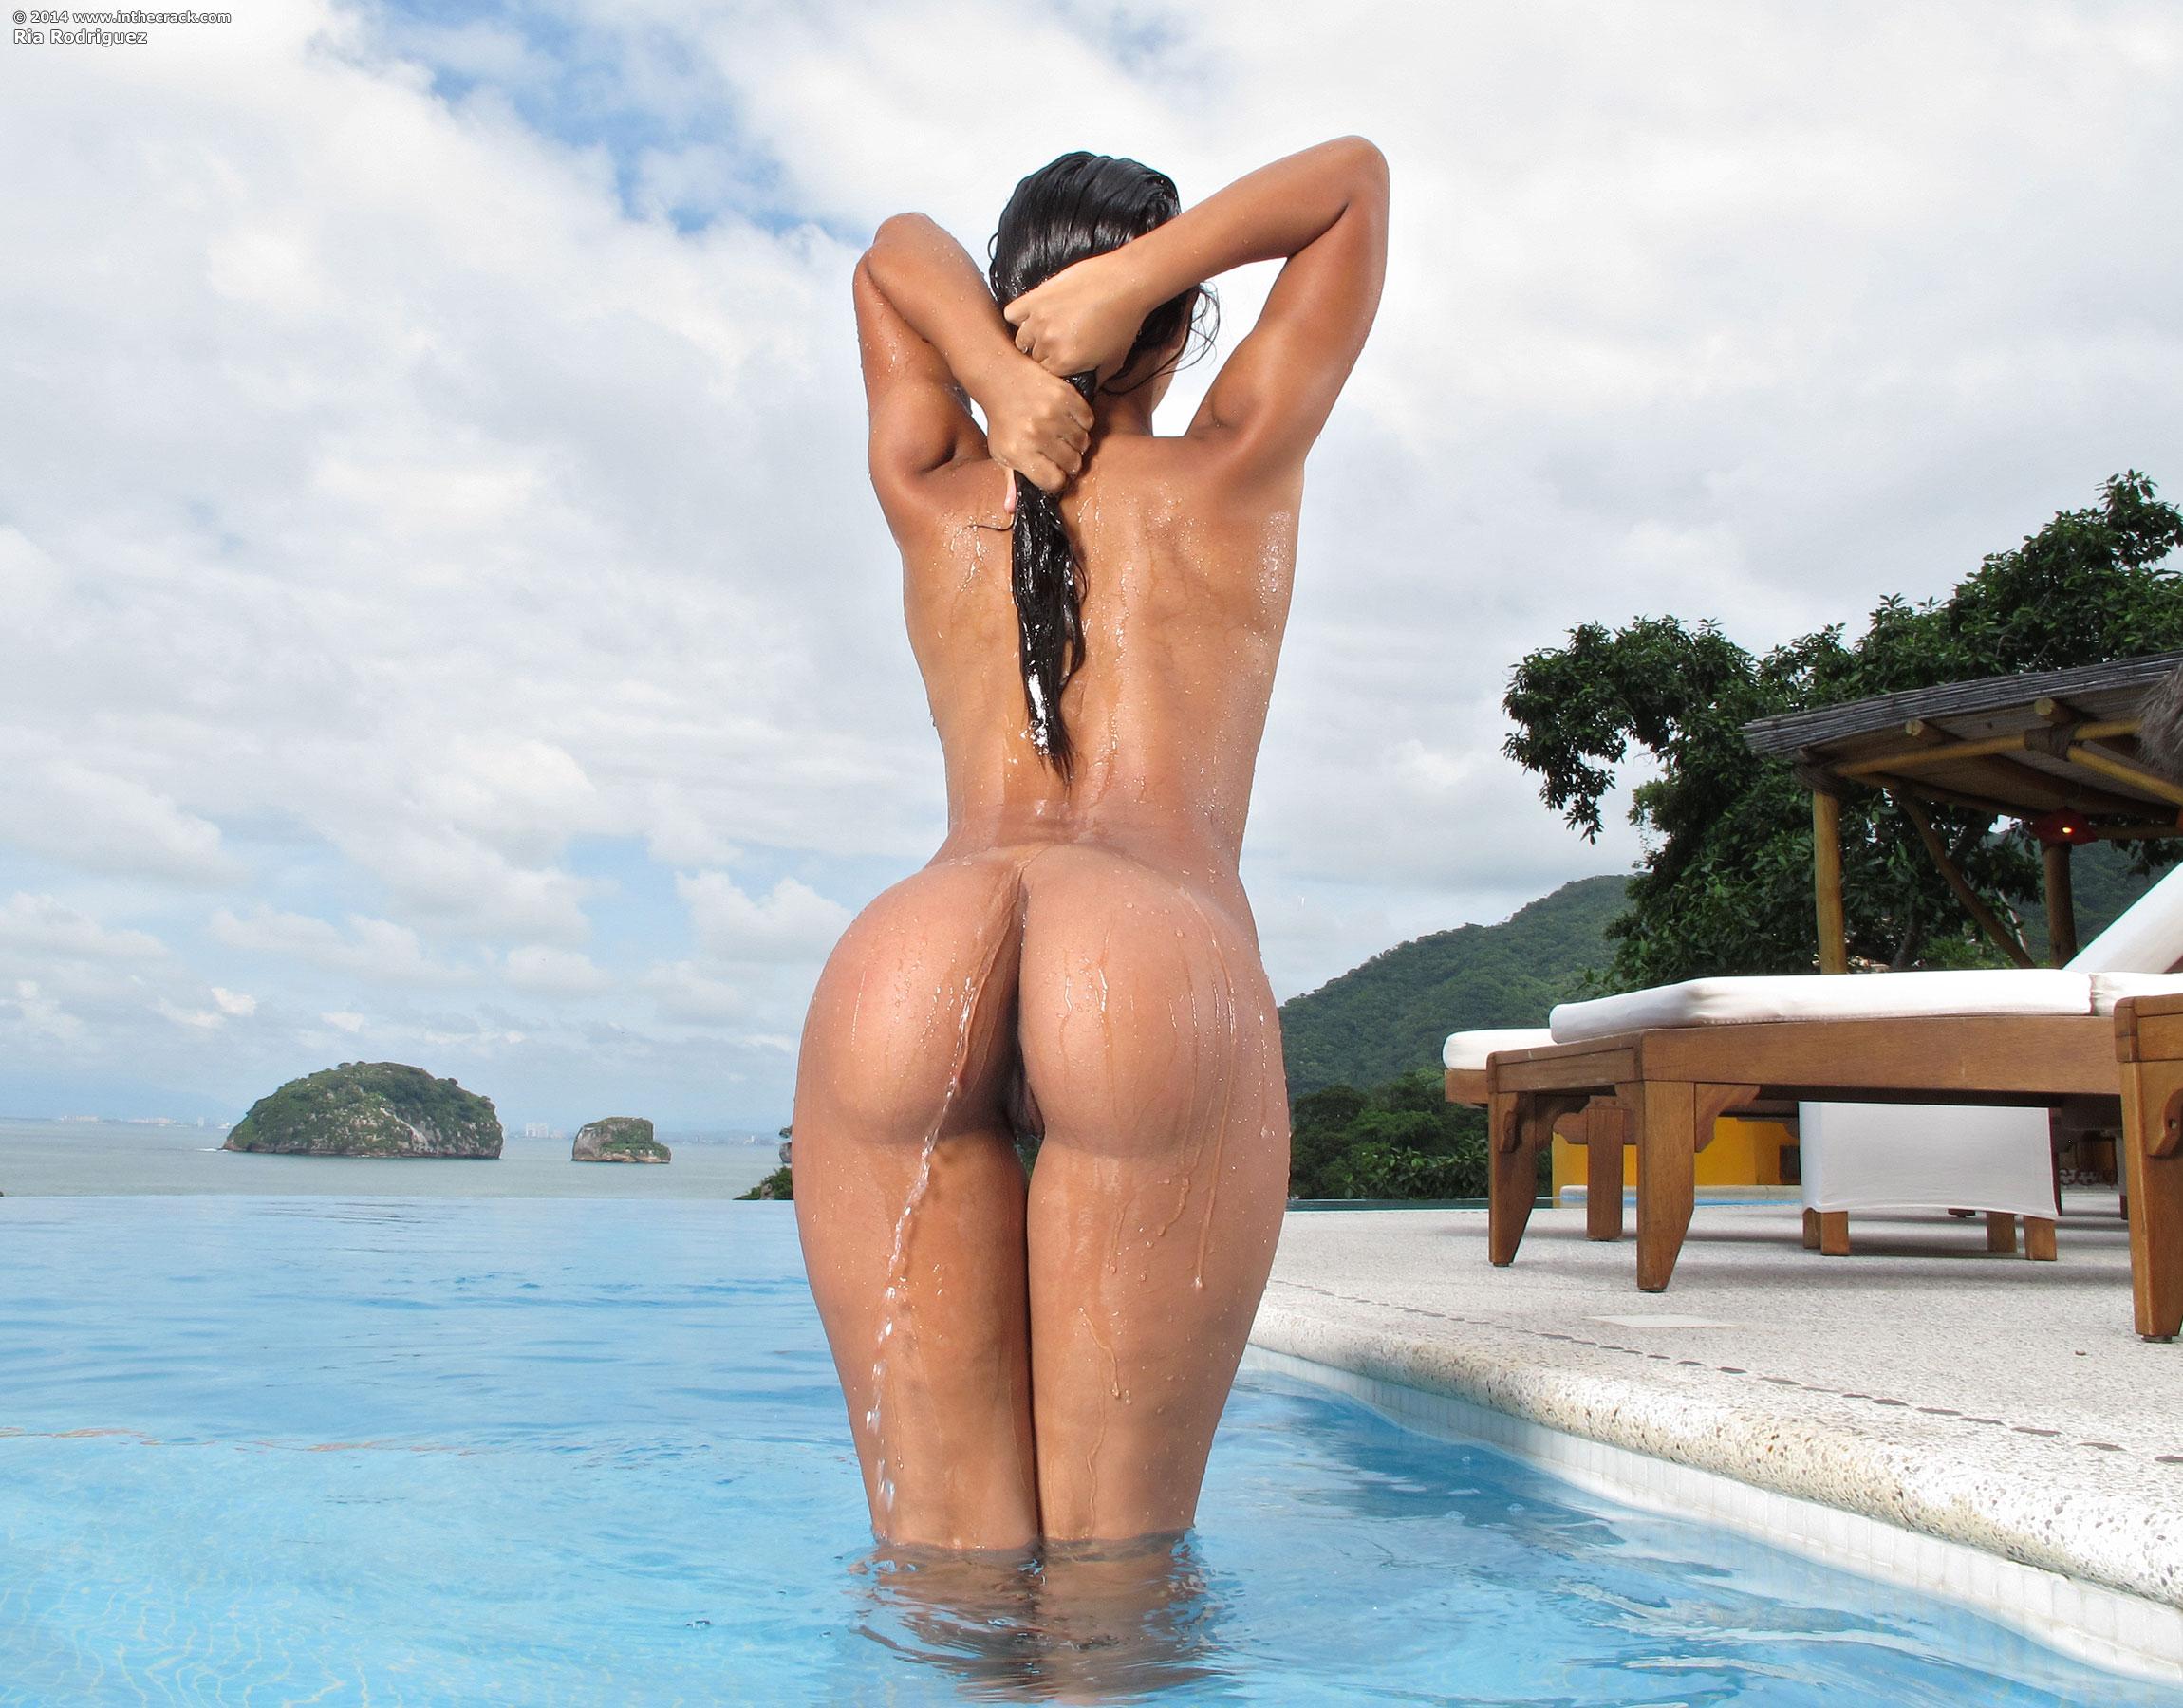 Ria-Rodriguez-Imgur.jpg